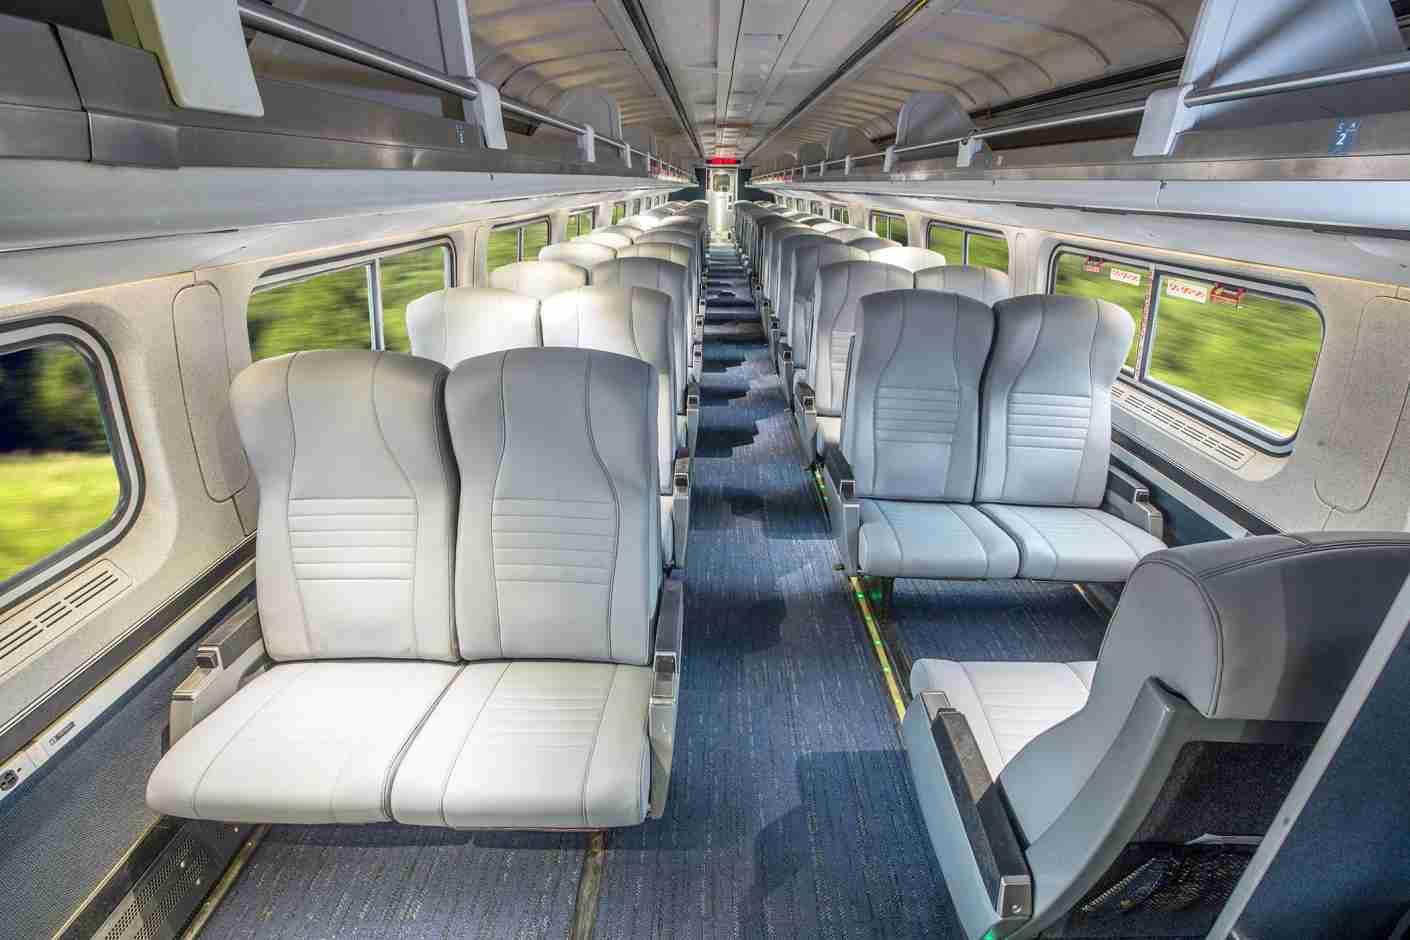 A refurbished coach car (Photo courtesy of Amtrak)